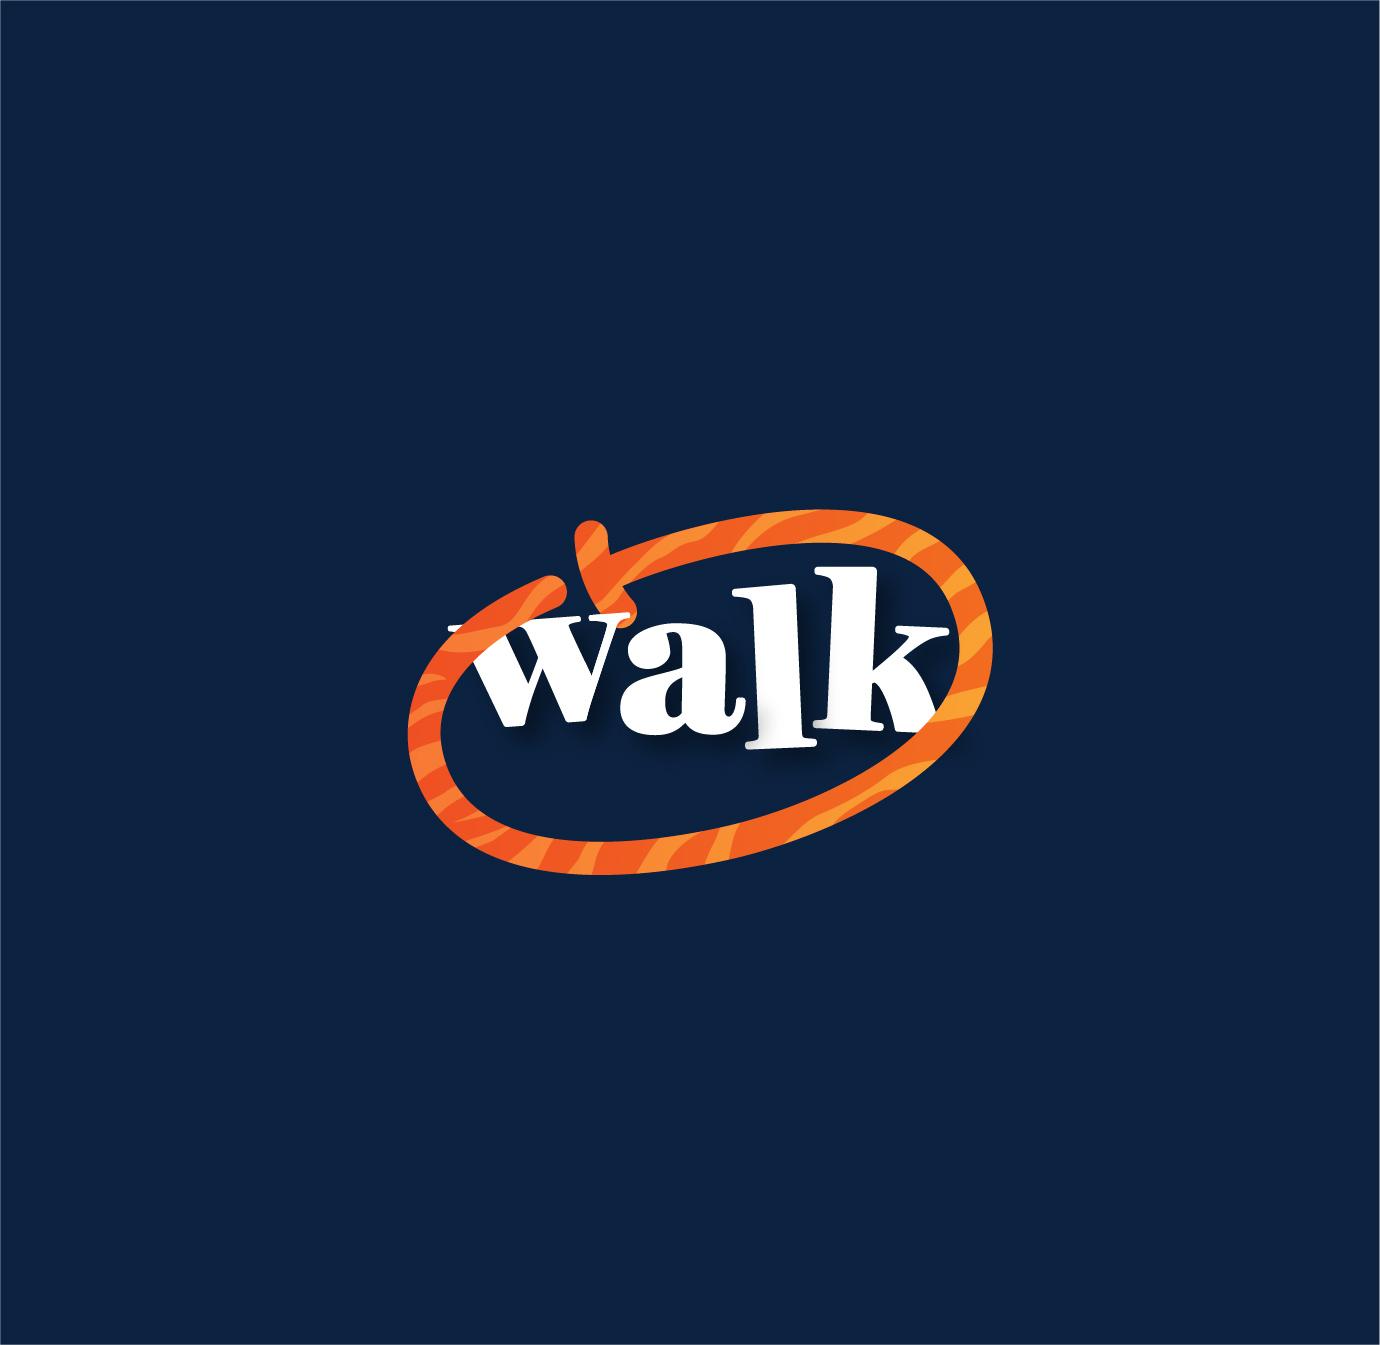 Walk image